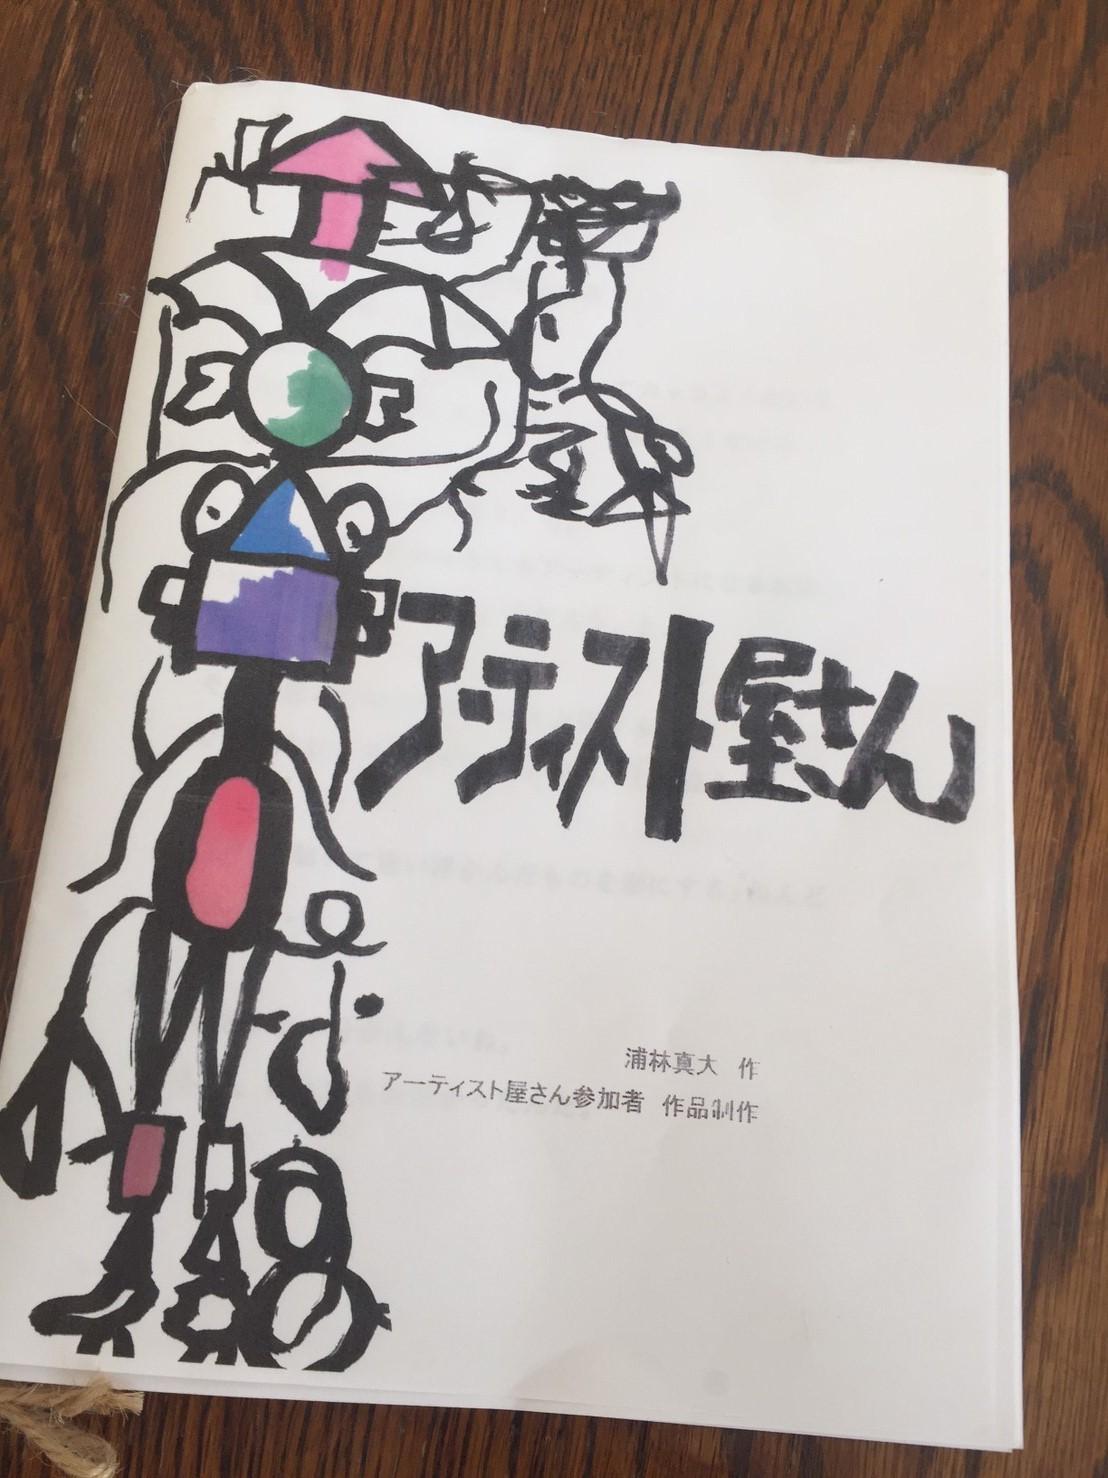 Tottori カルマ  カルマ焼飯_e0115904_22433056.jpg